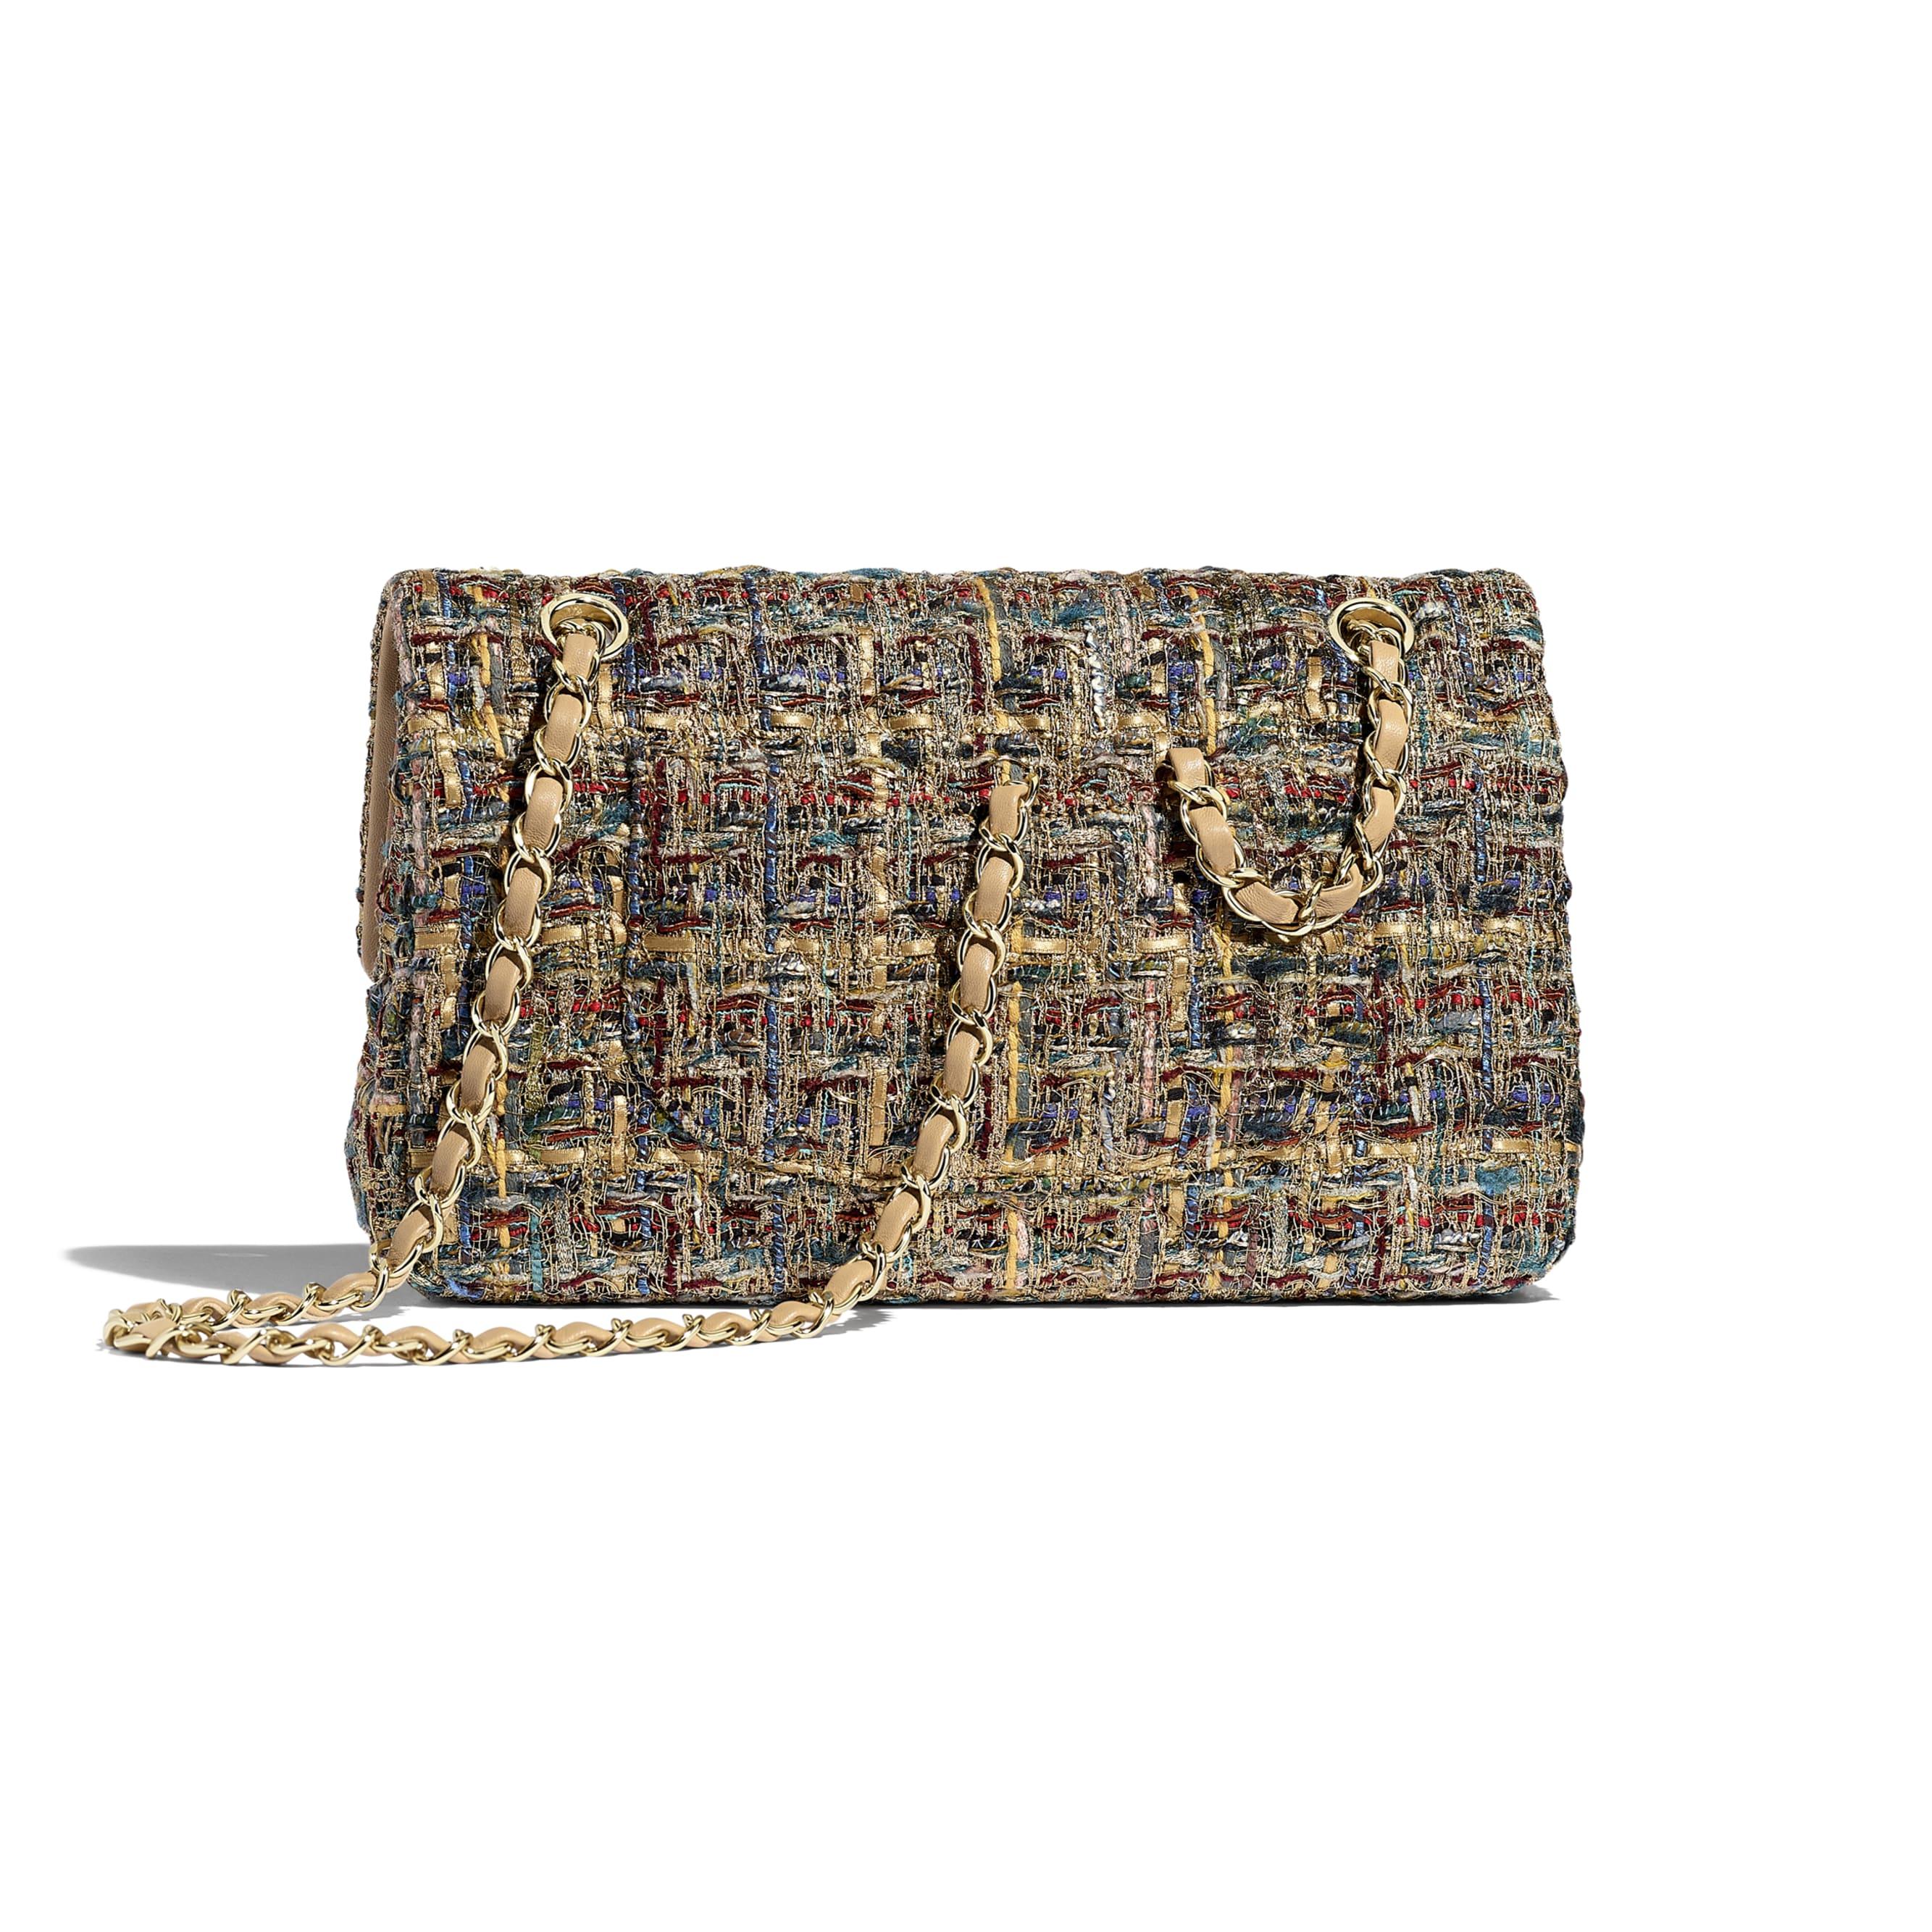 Classic Handbag - Gold, Blue & Green - Tweed & Gold-Tone Metal - Alternative view - see standard sized version